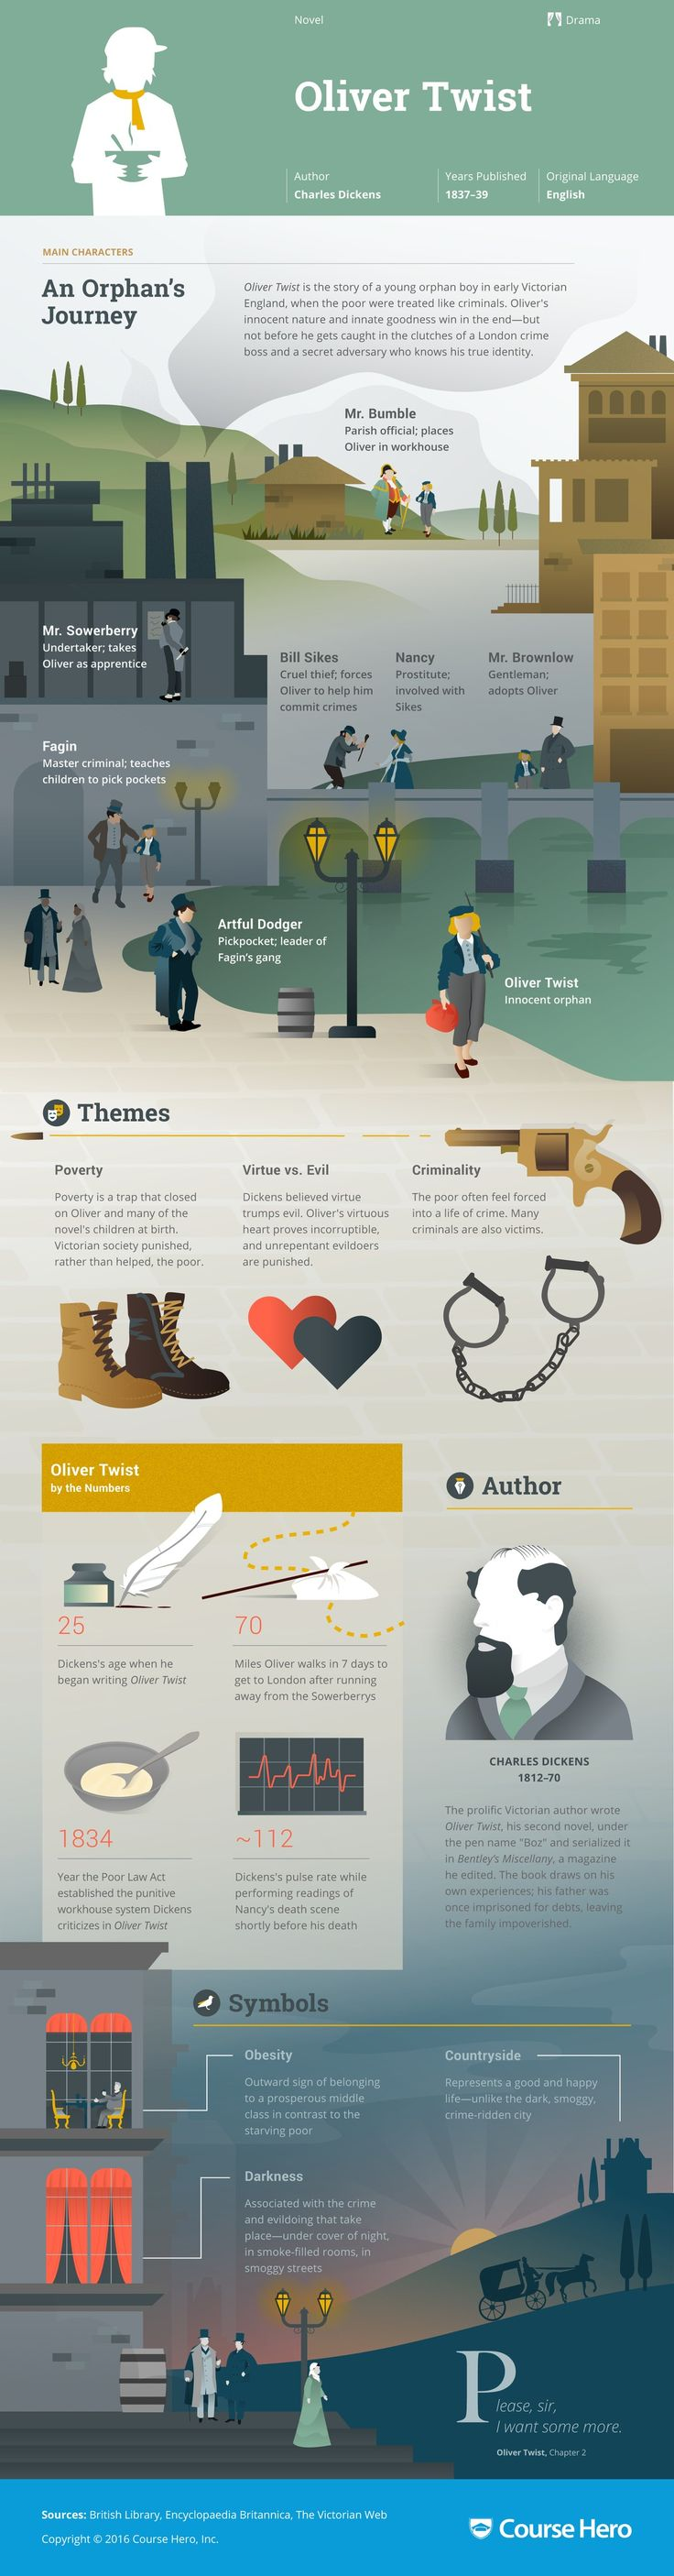 Oliver Twist Infographic | Course Hero